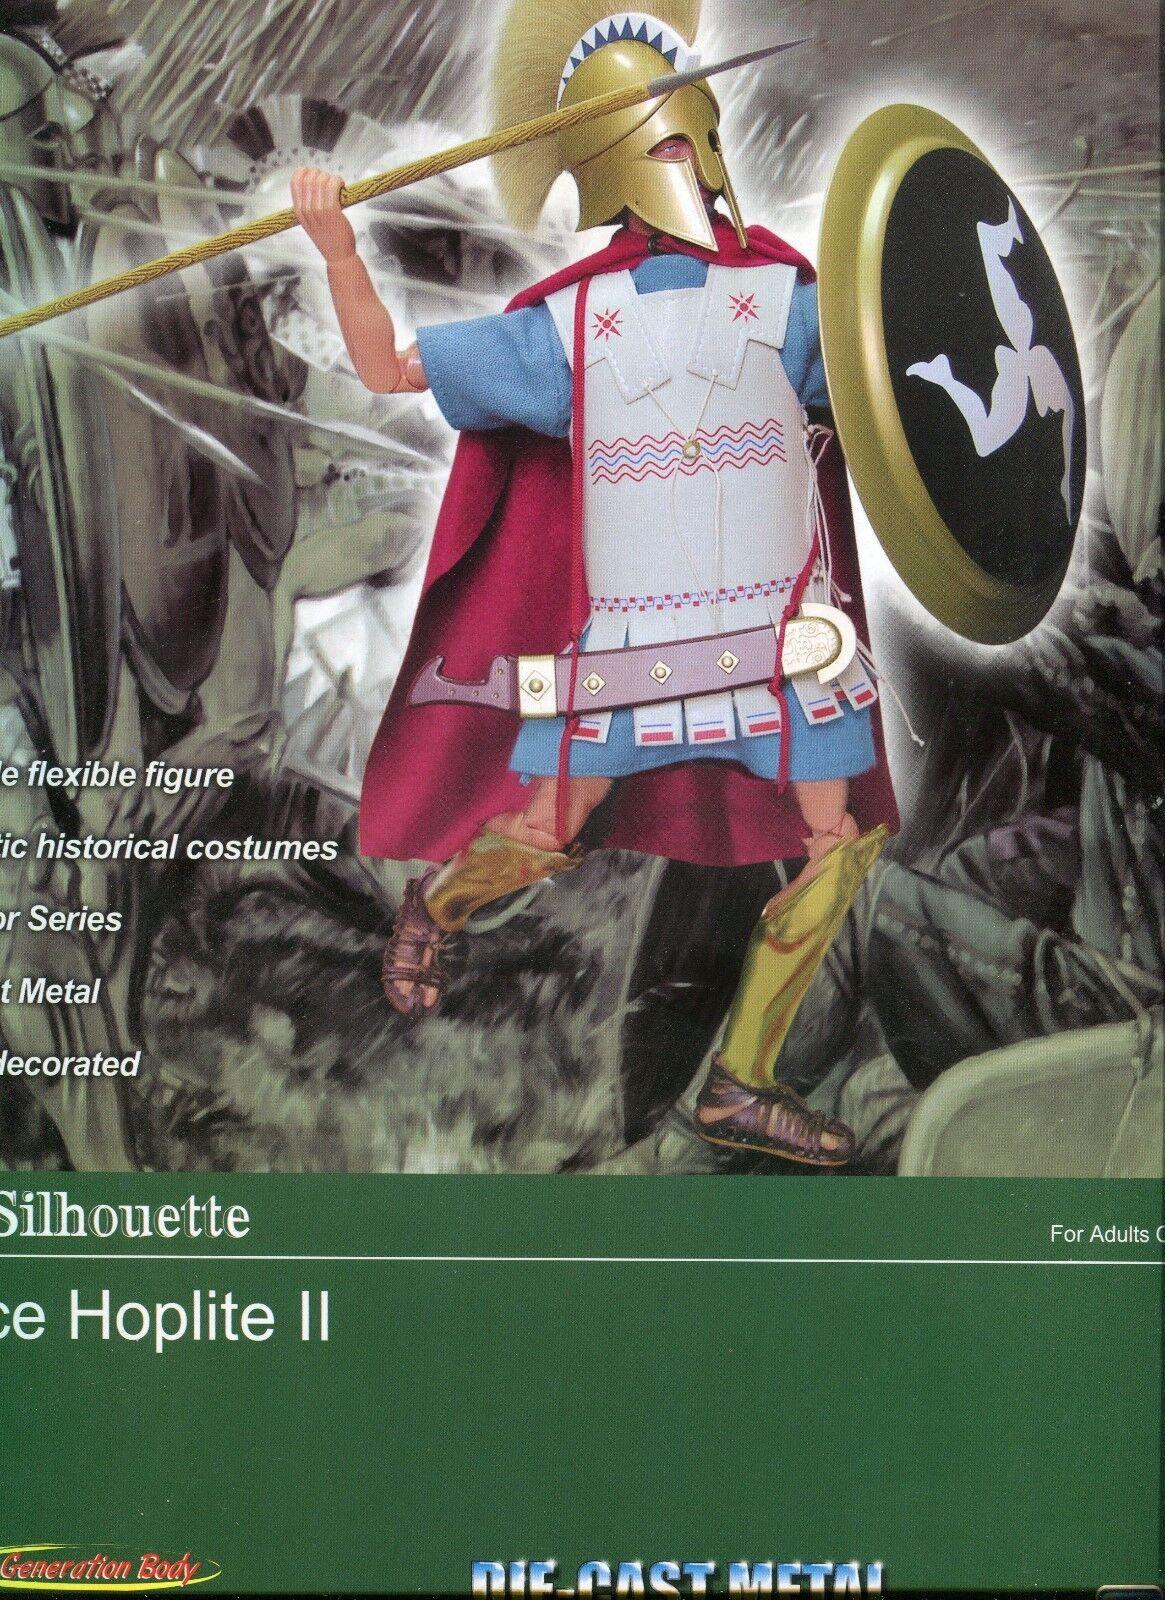 Greek Hoplite 2 1 6 scale